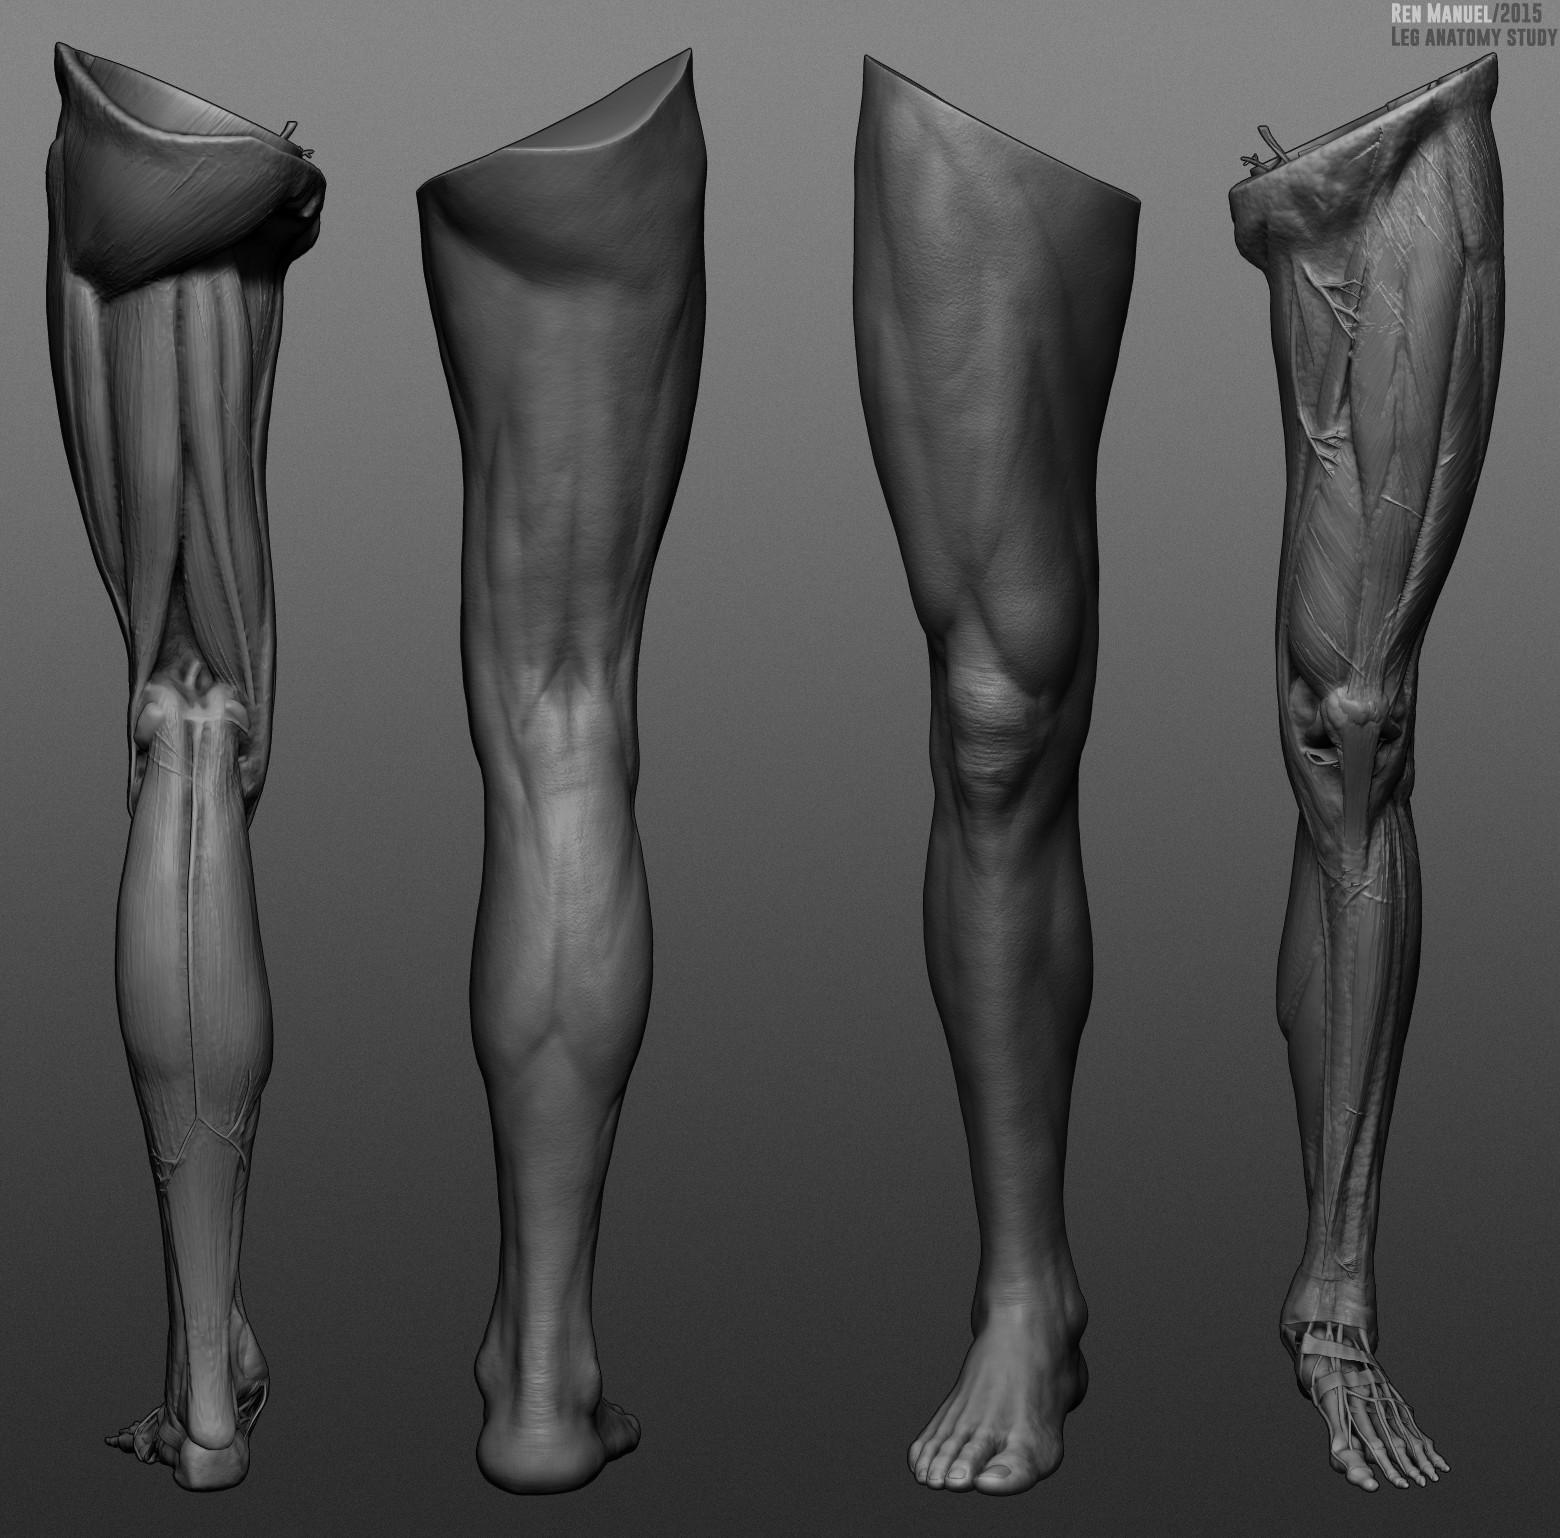 Ren Manuel Leg Anatomy Study